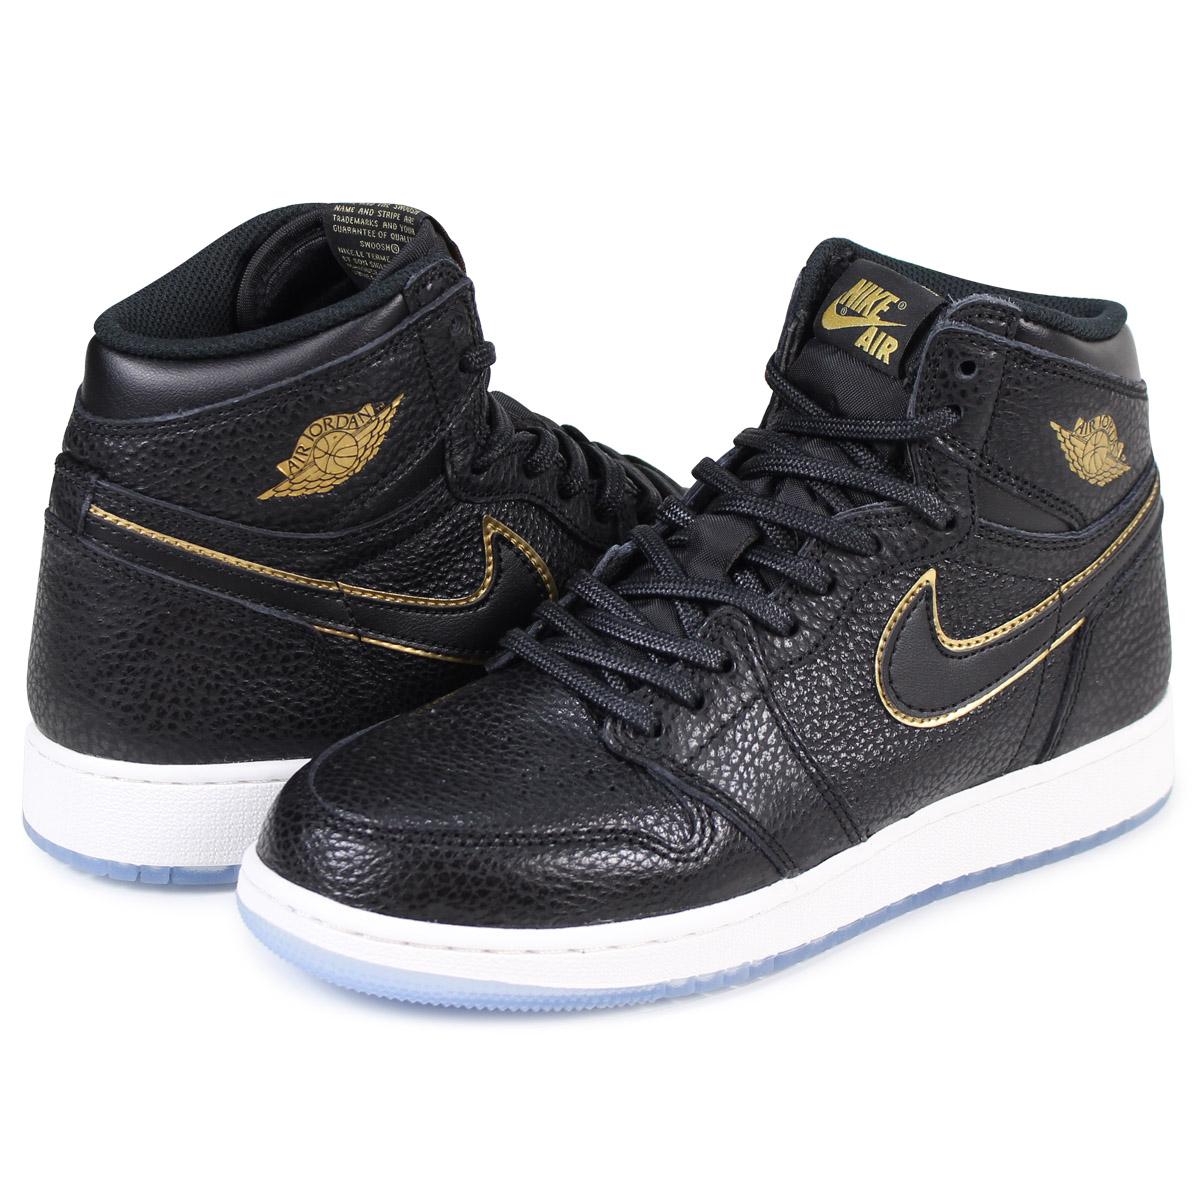 the best attitude 80992 9a758 NIKE AIR JORDAN 1 RETRO HIGH OG GS LA Nike Air Jordan 1 nostalgic Haile Dis sneakers  575,441-031 black  load planned Shinnyu load in reservation product ...